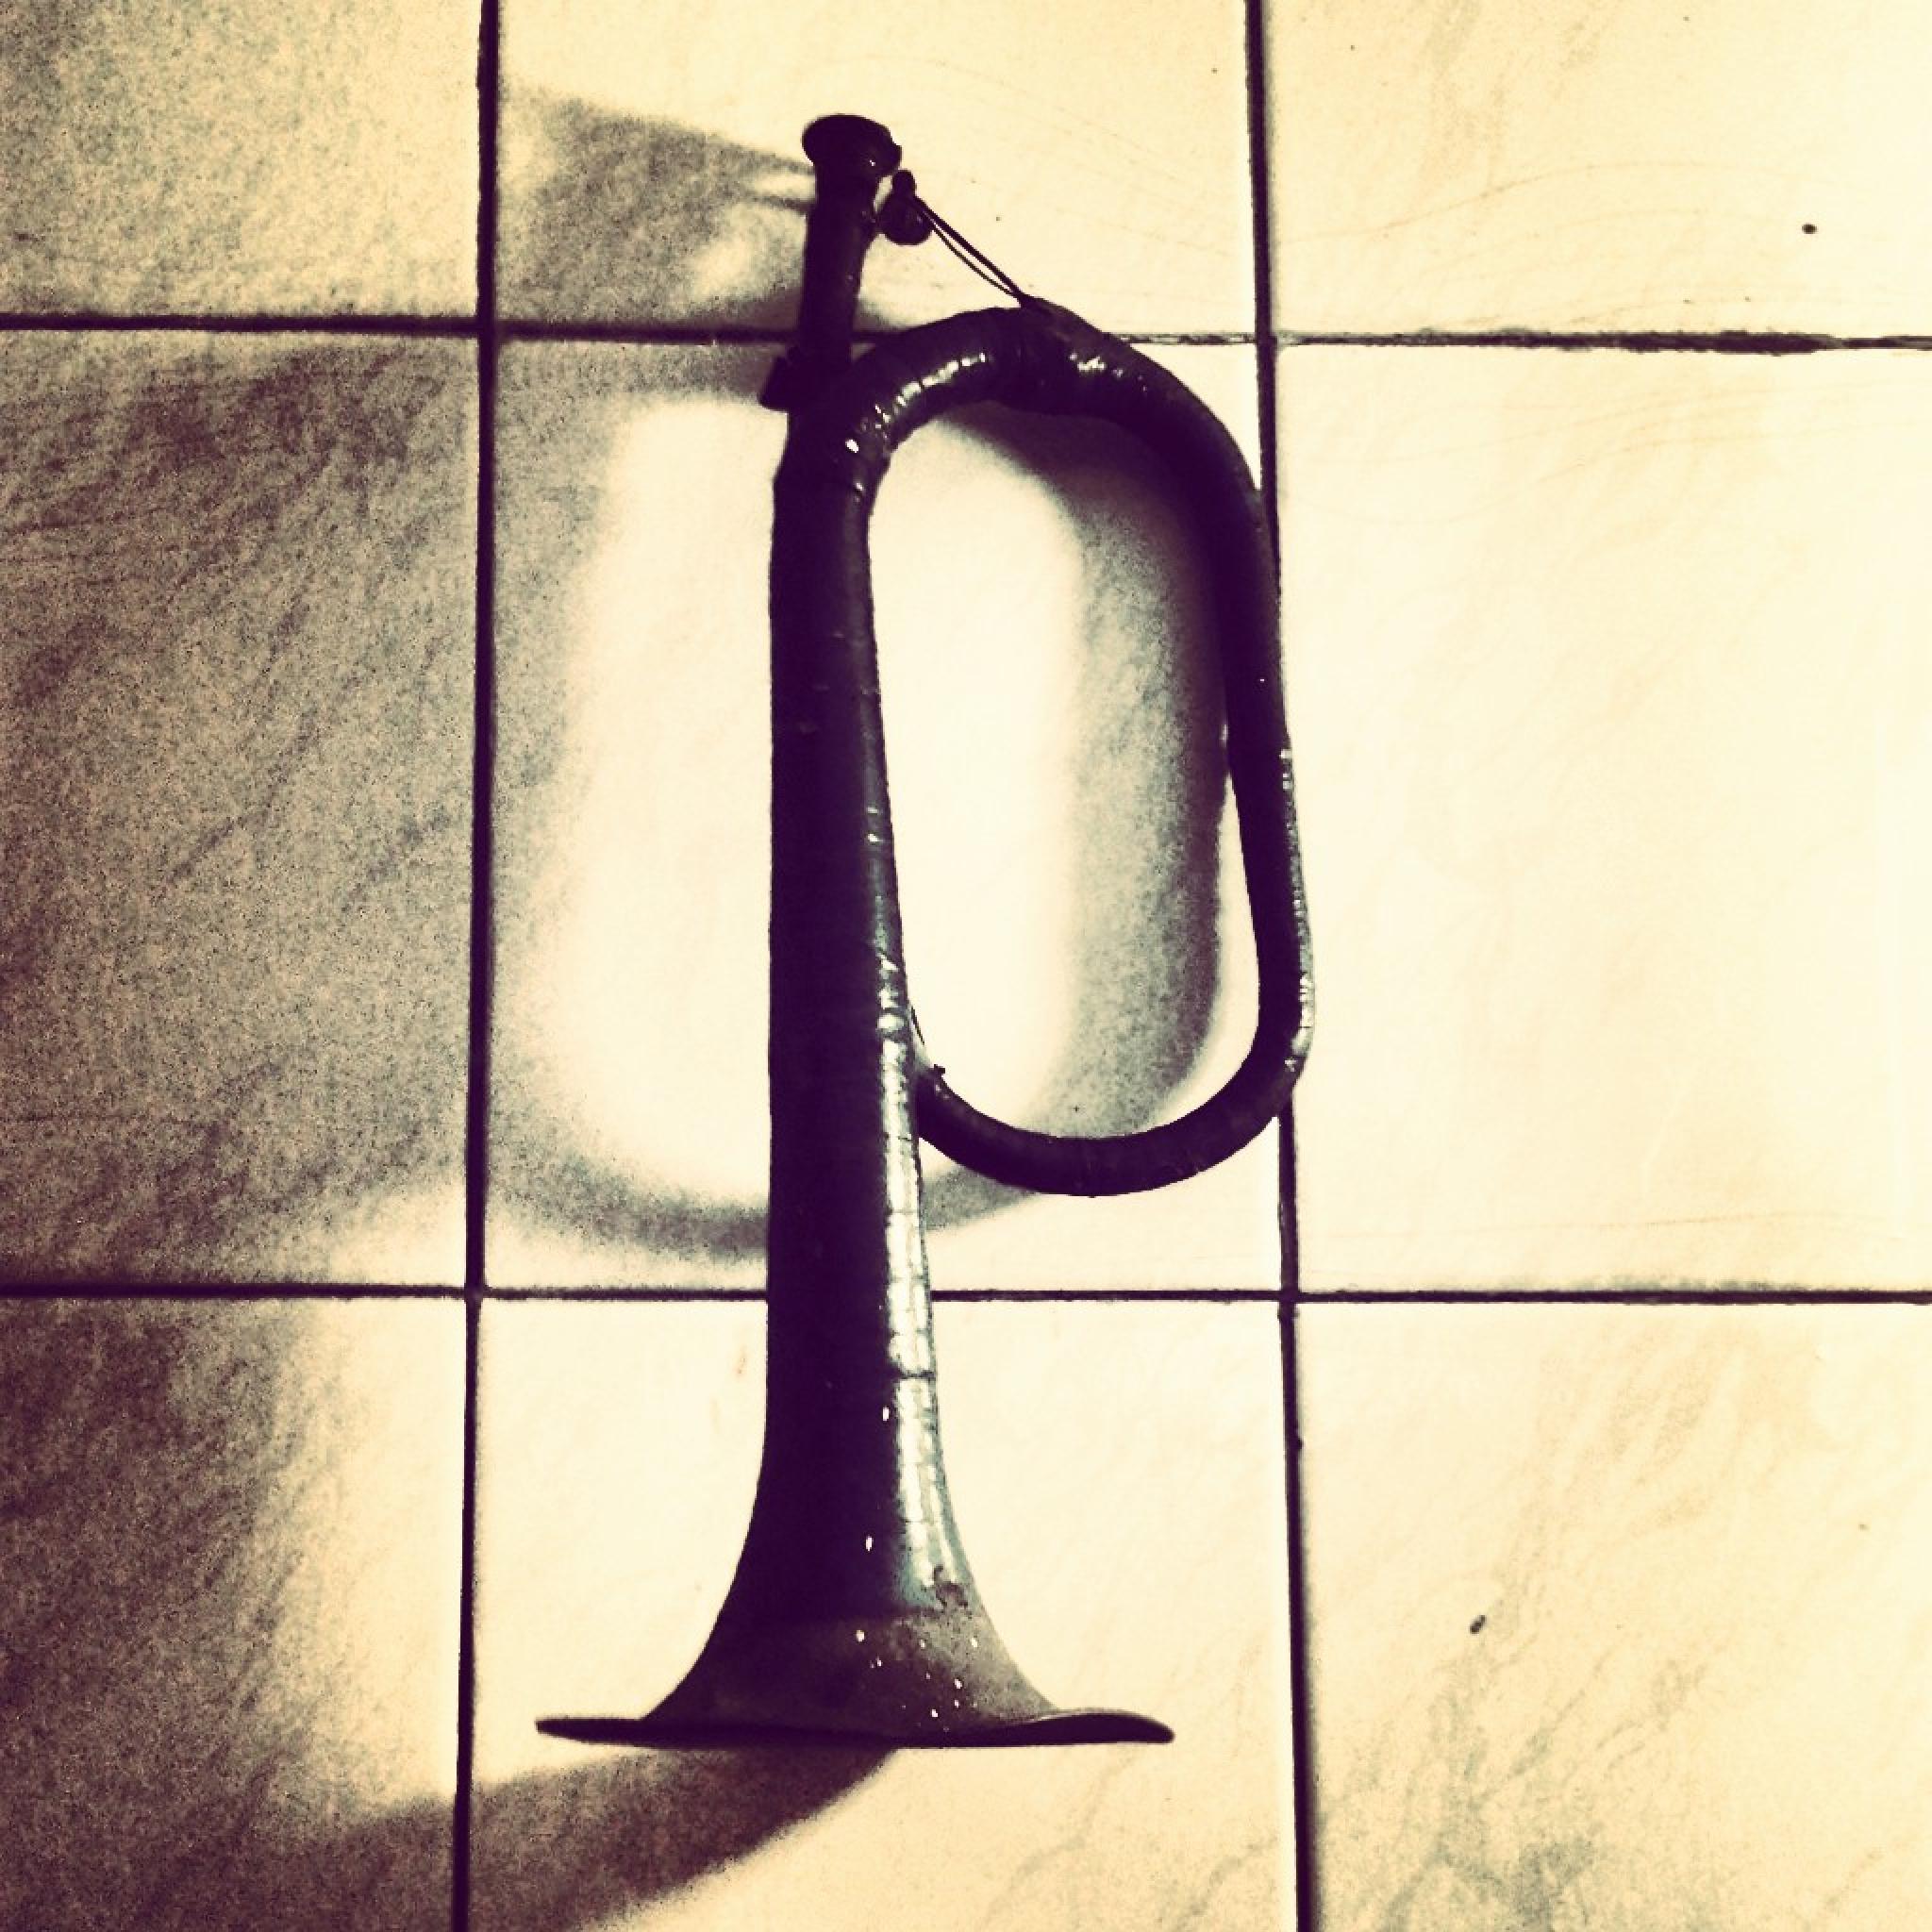 Memoirs trumpet by sarallah.akbari